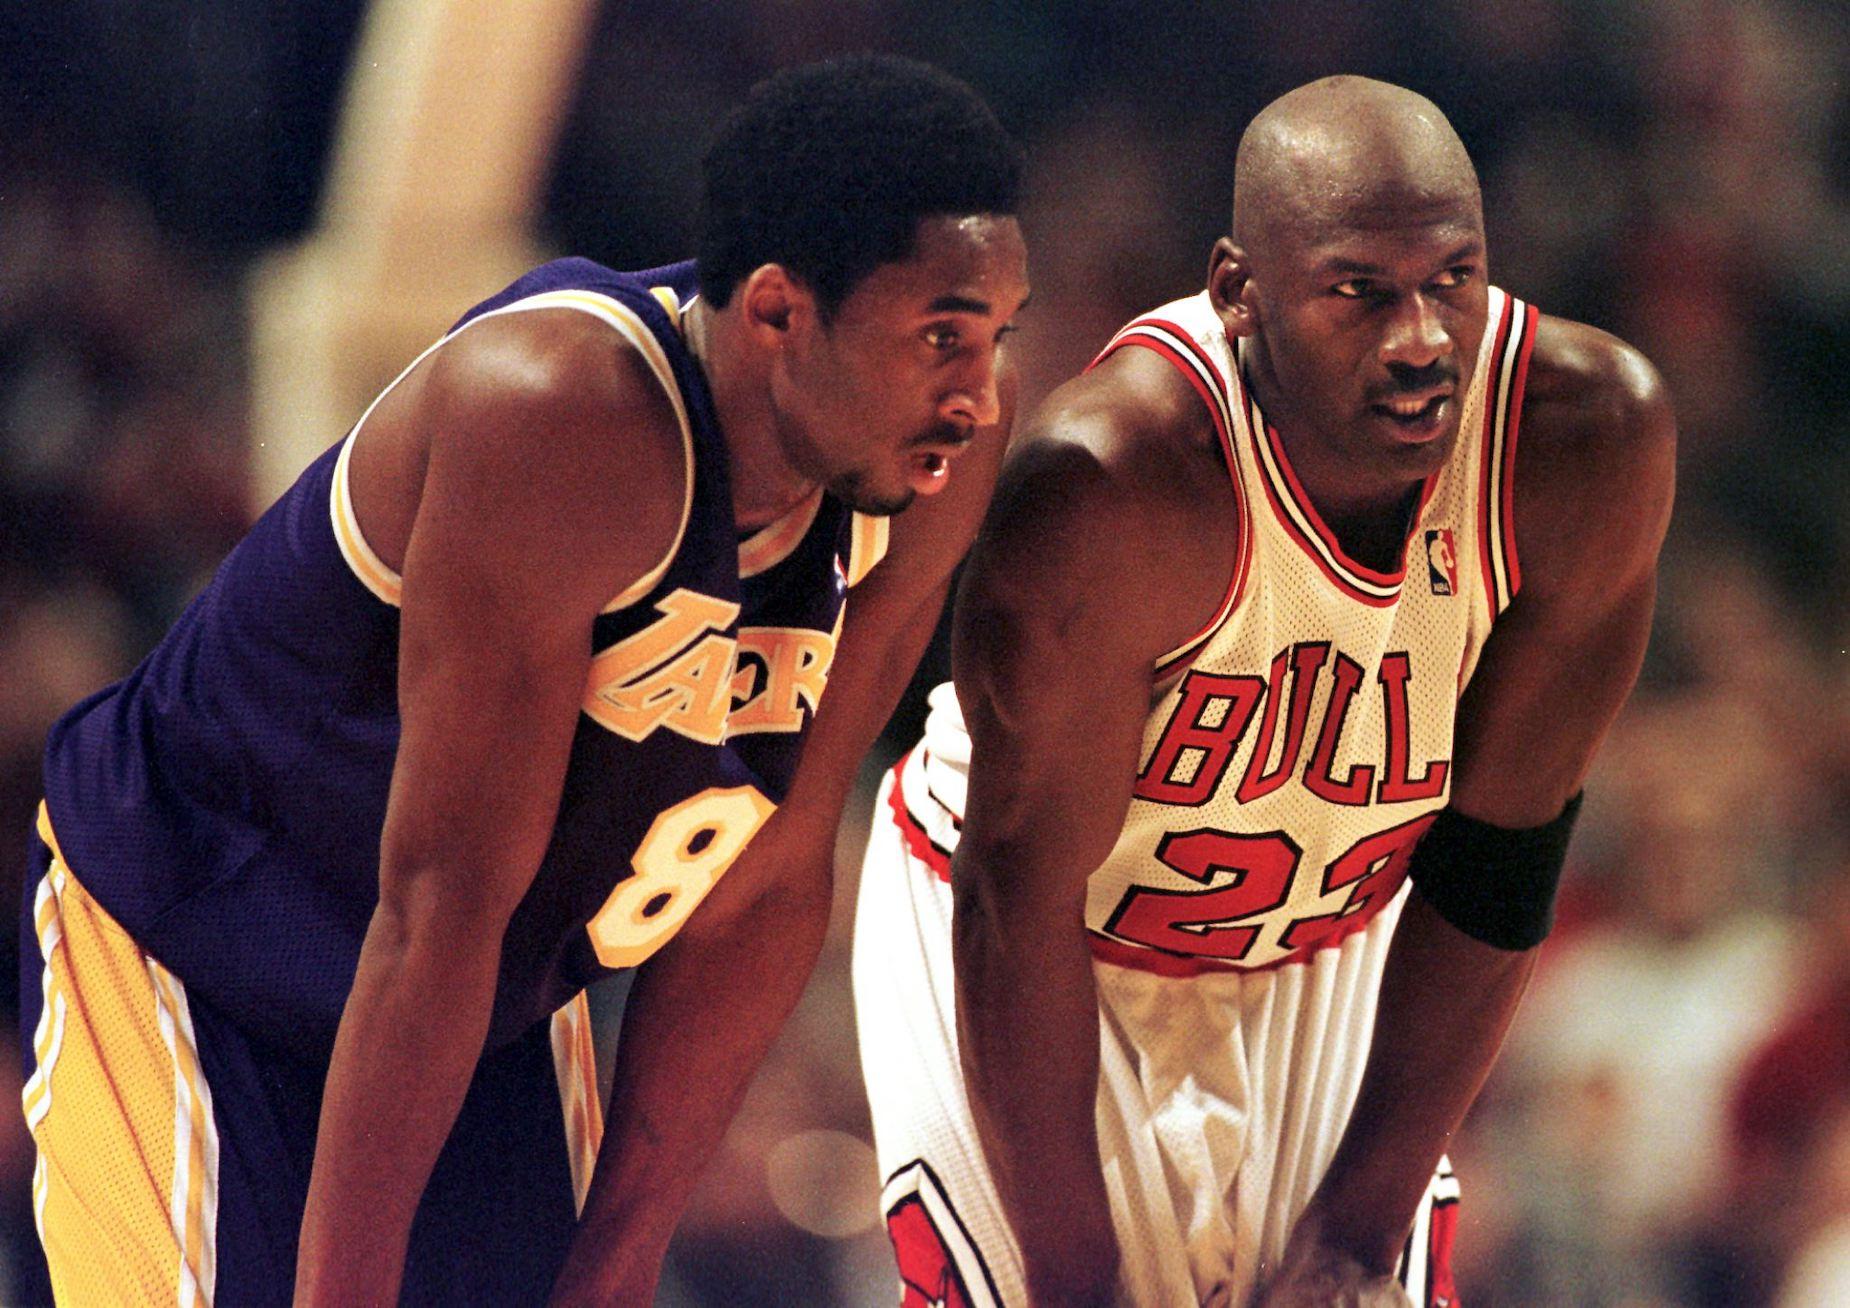 Kobe Bryant (L) faced Michael Jordan (R) in the NBA